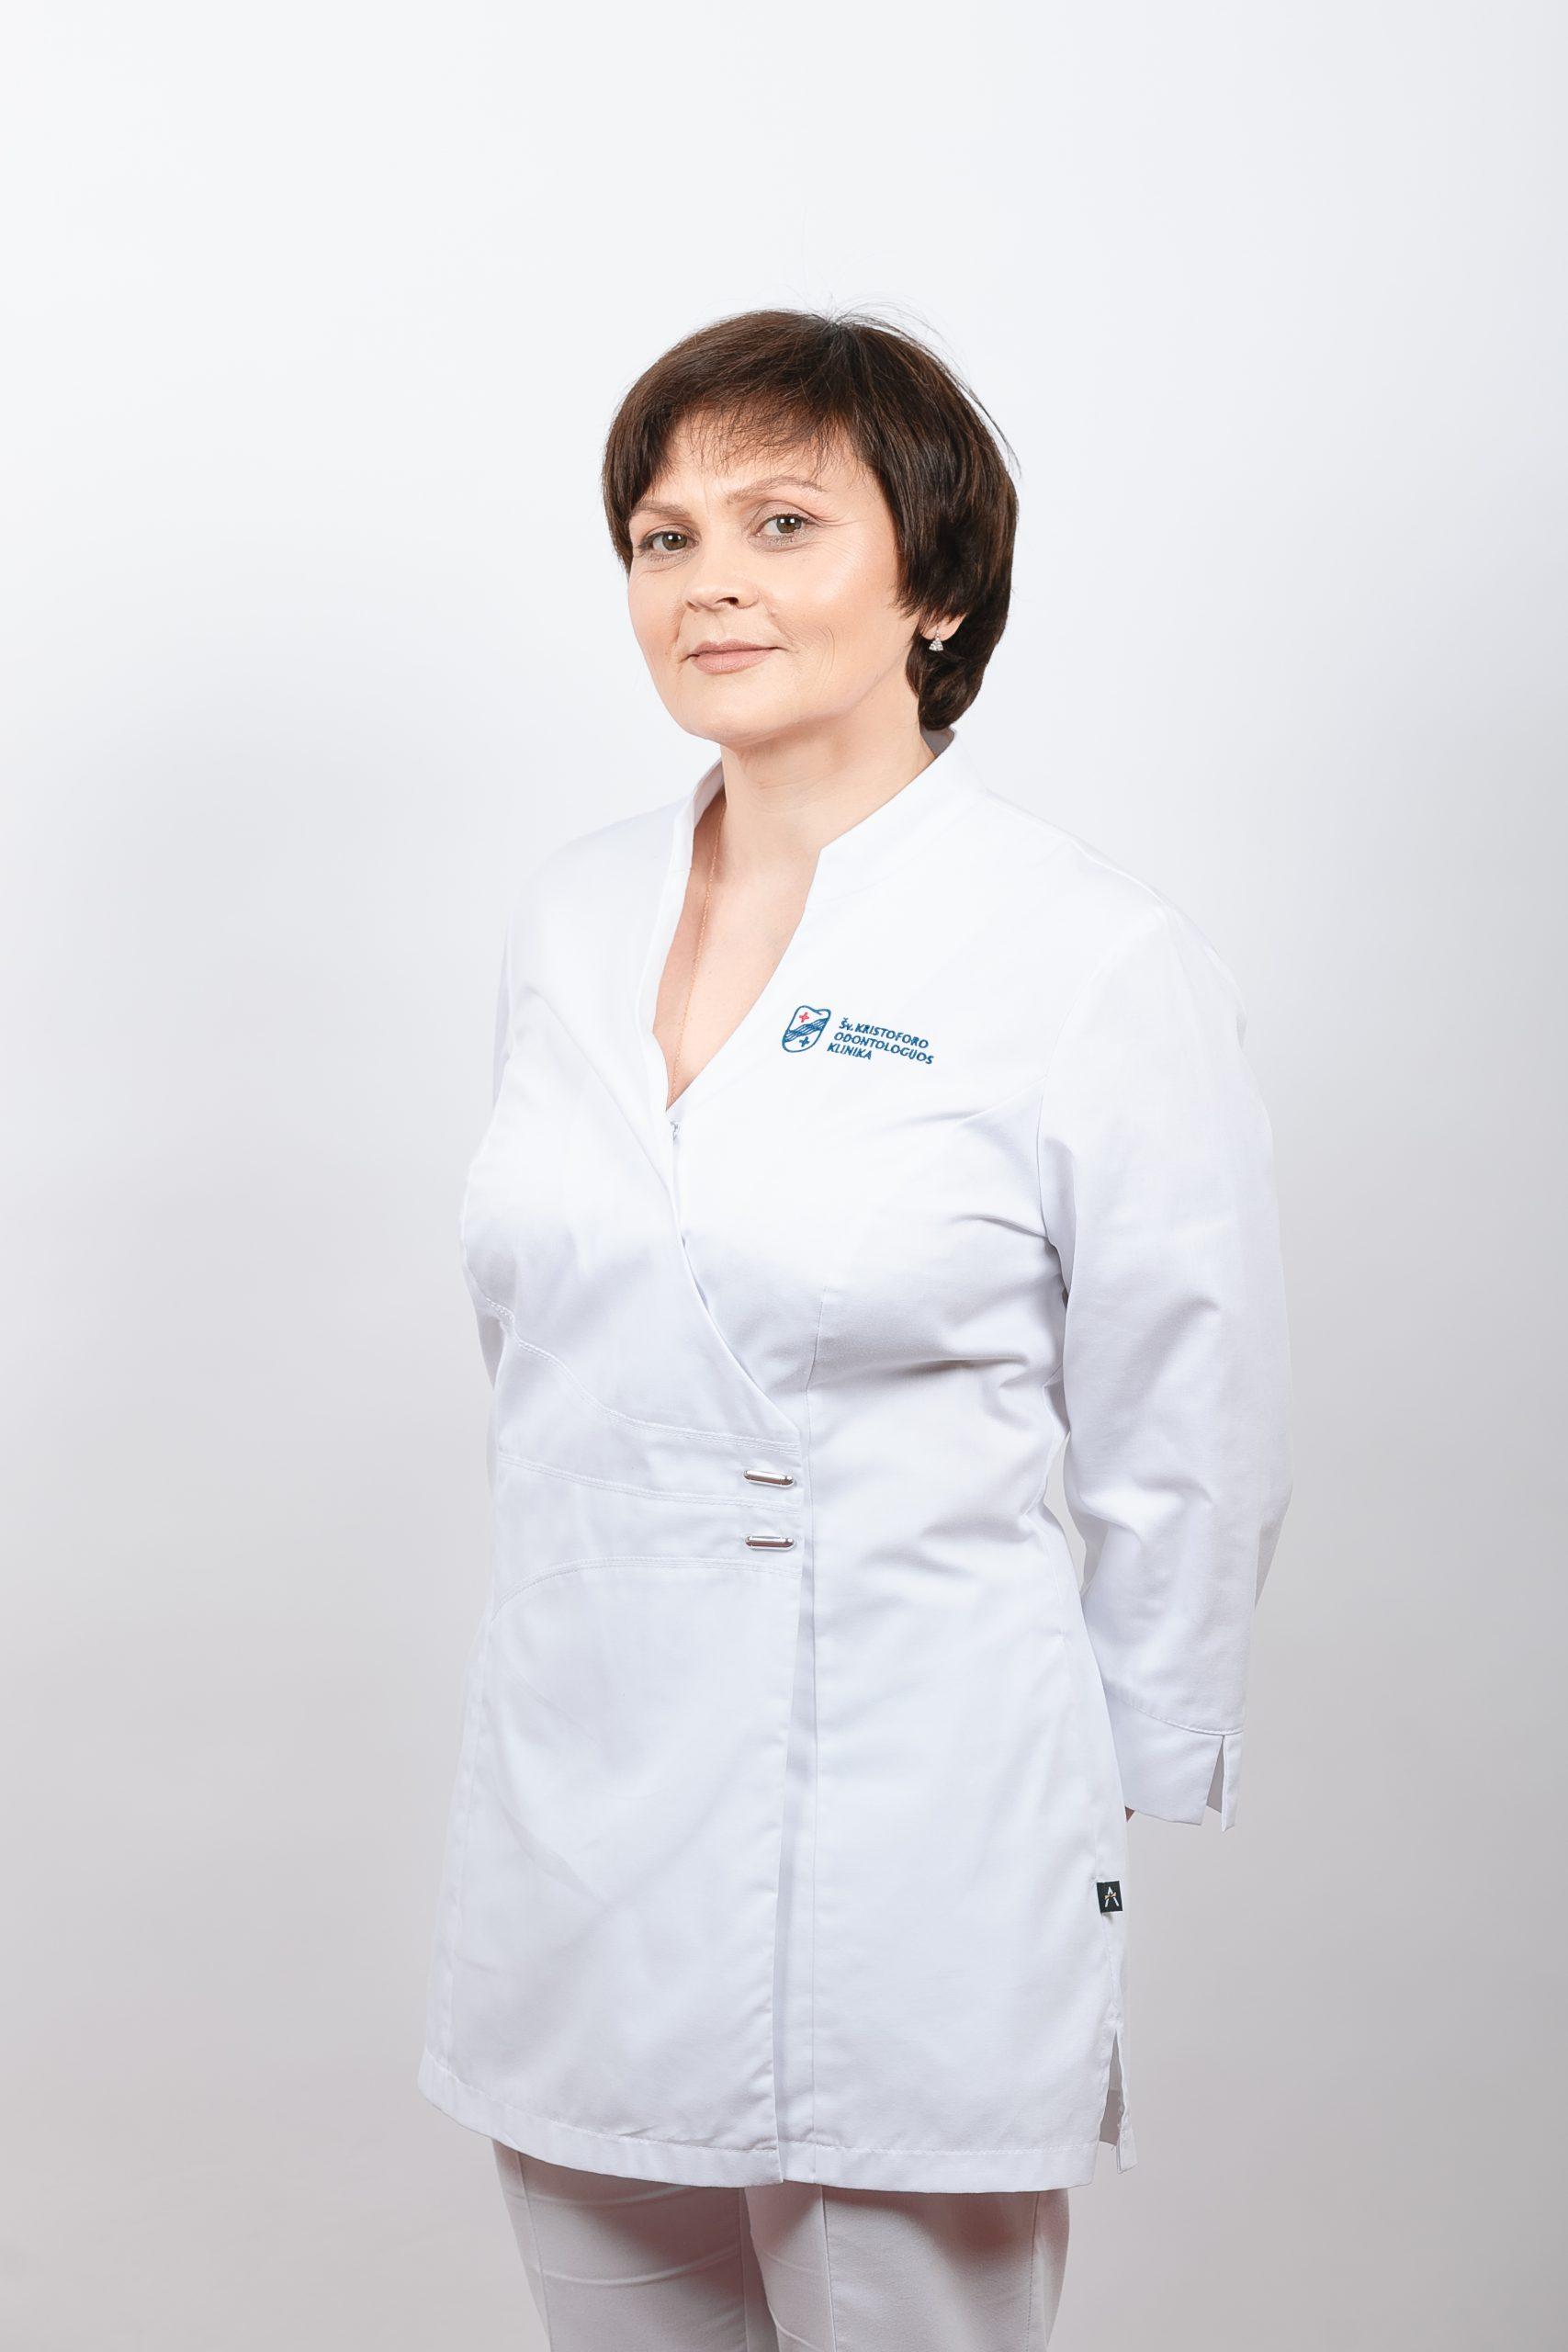 Gydytoja odontologė Olga Siniakova